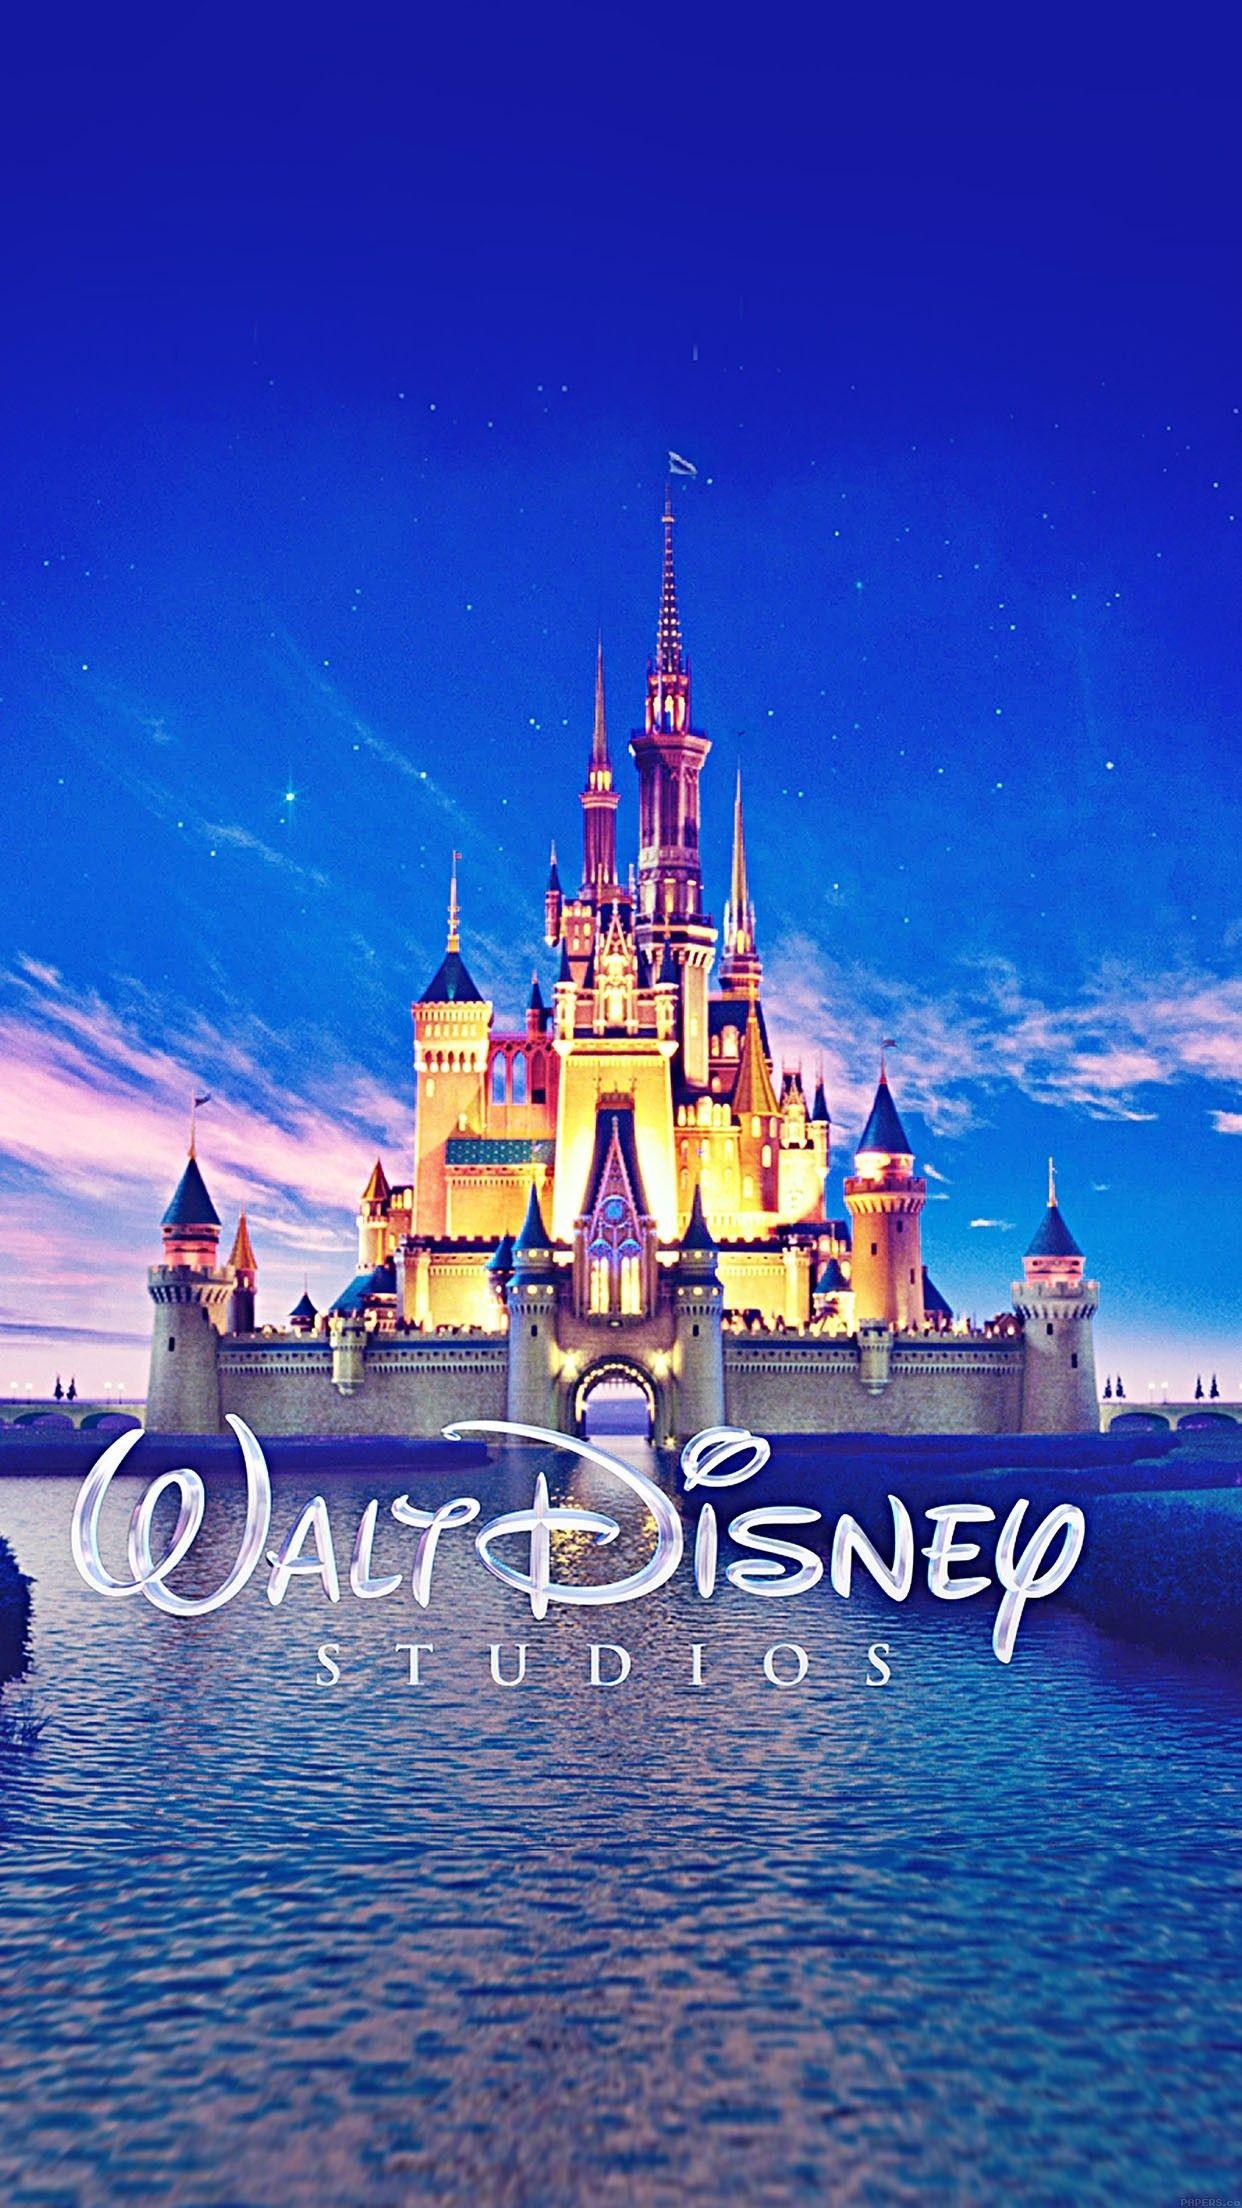 Disney Castle Wallpaper Tumblr Wallpaper Iphone Disney Walt Disney Studios Walt Disney Castle